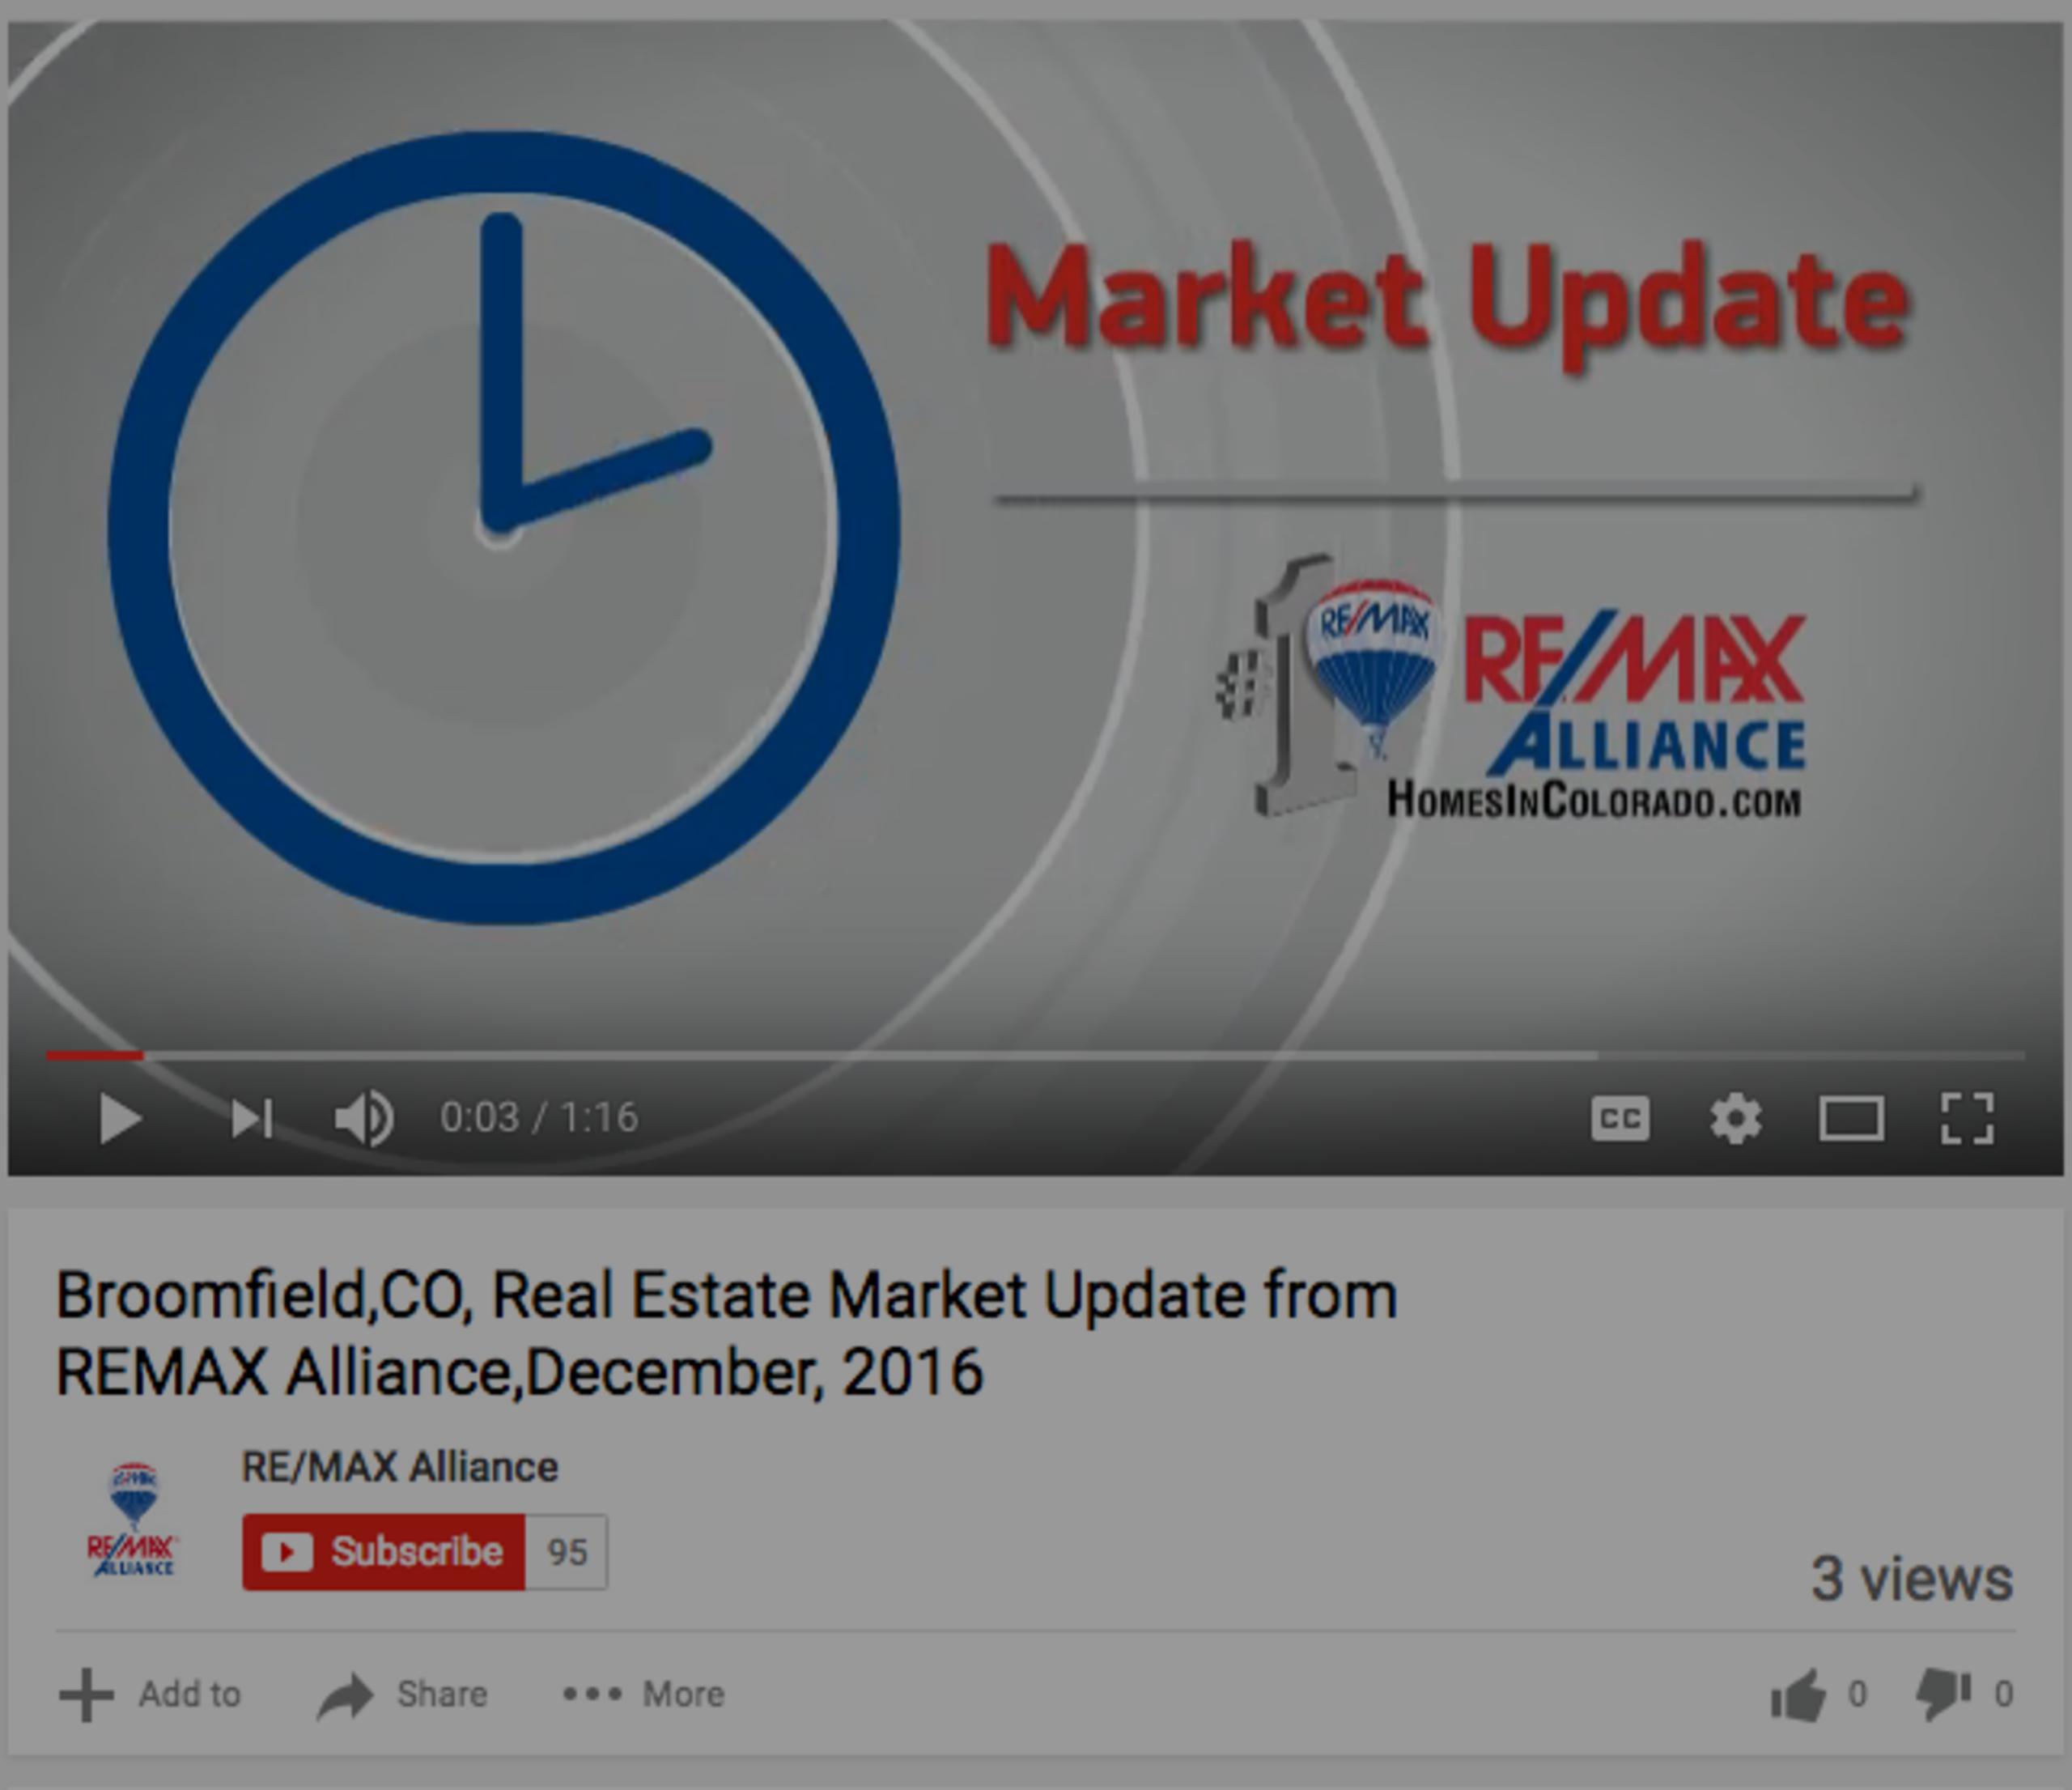 Broomfield Real Estate Market Update December 2016